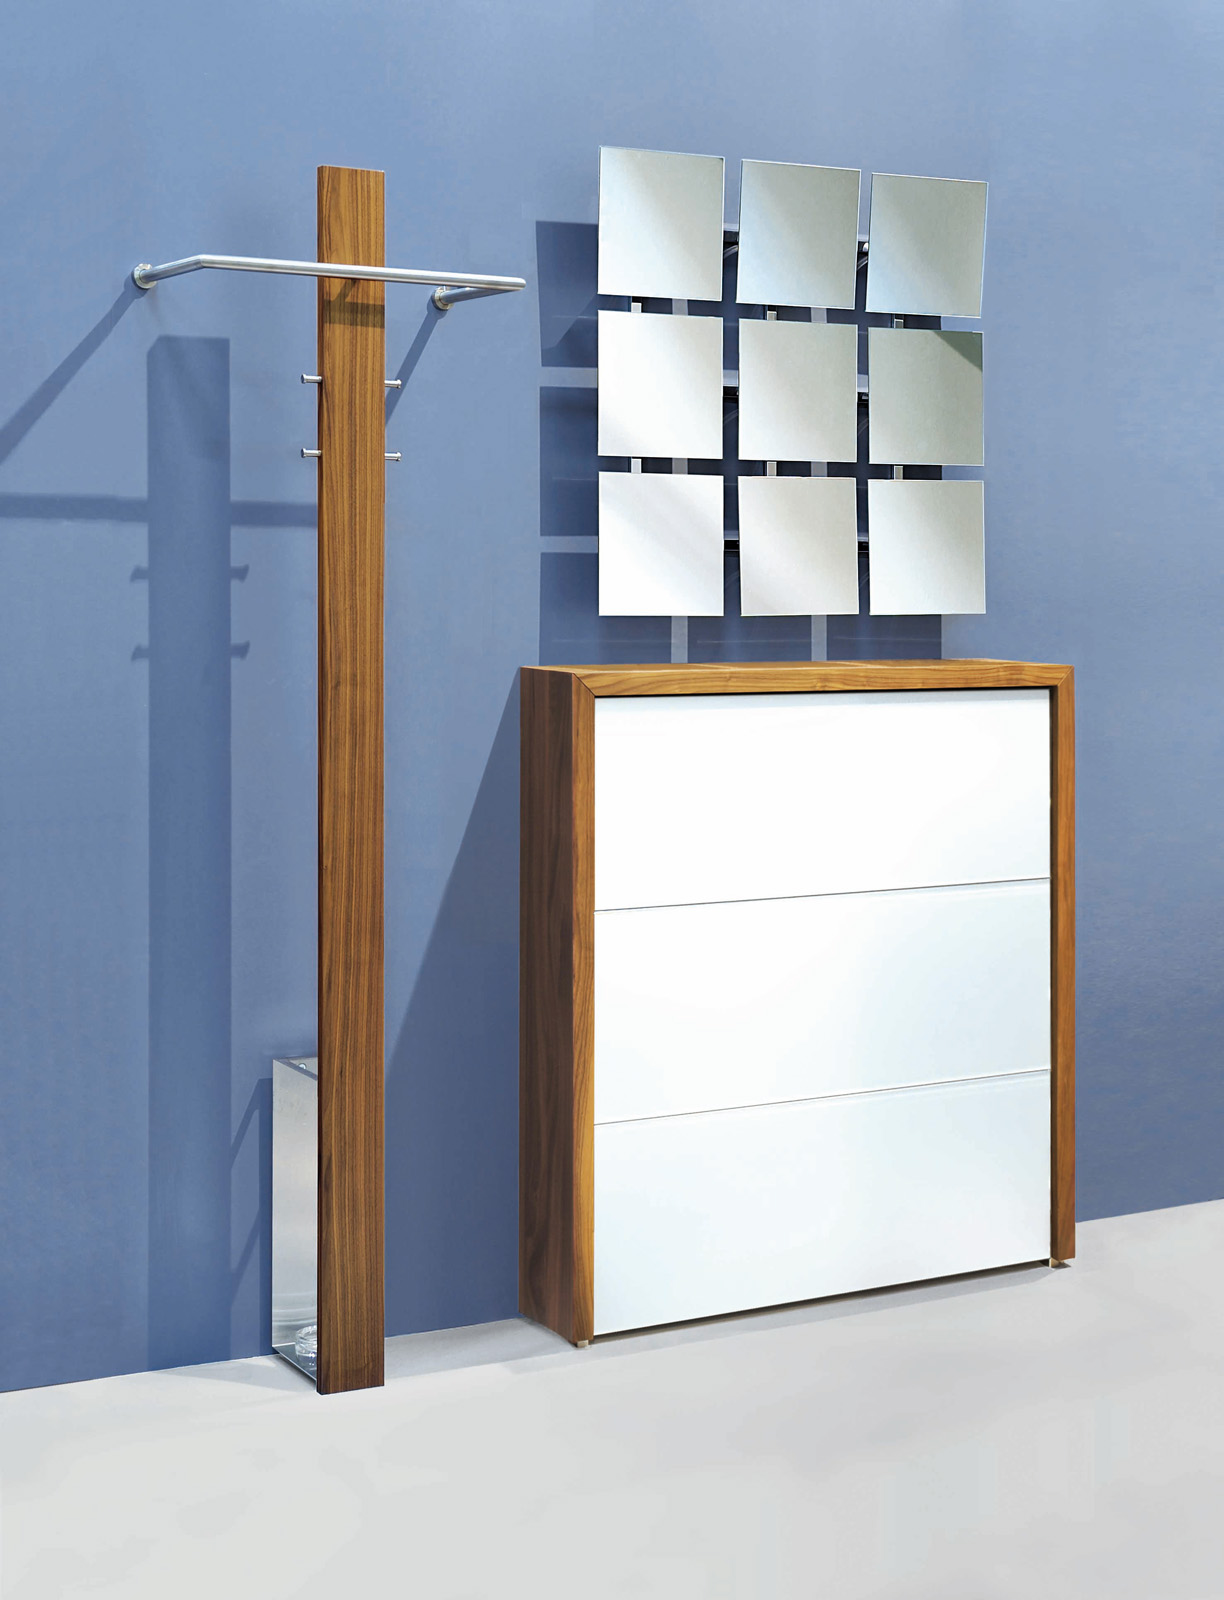 Emejing Klapdeuren Woonkamer Pictures - Modern Design Ideas ...